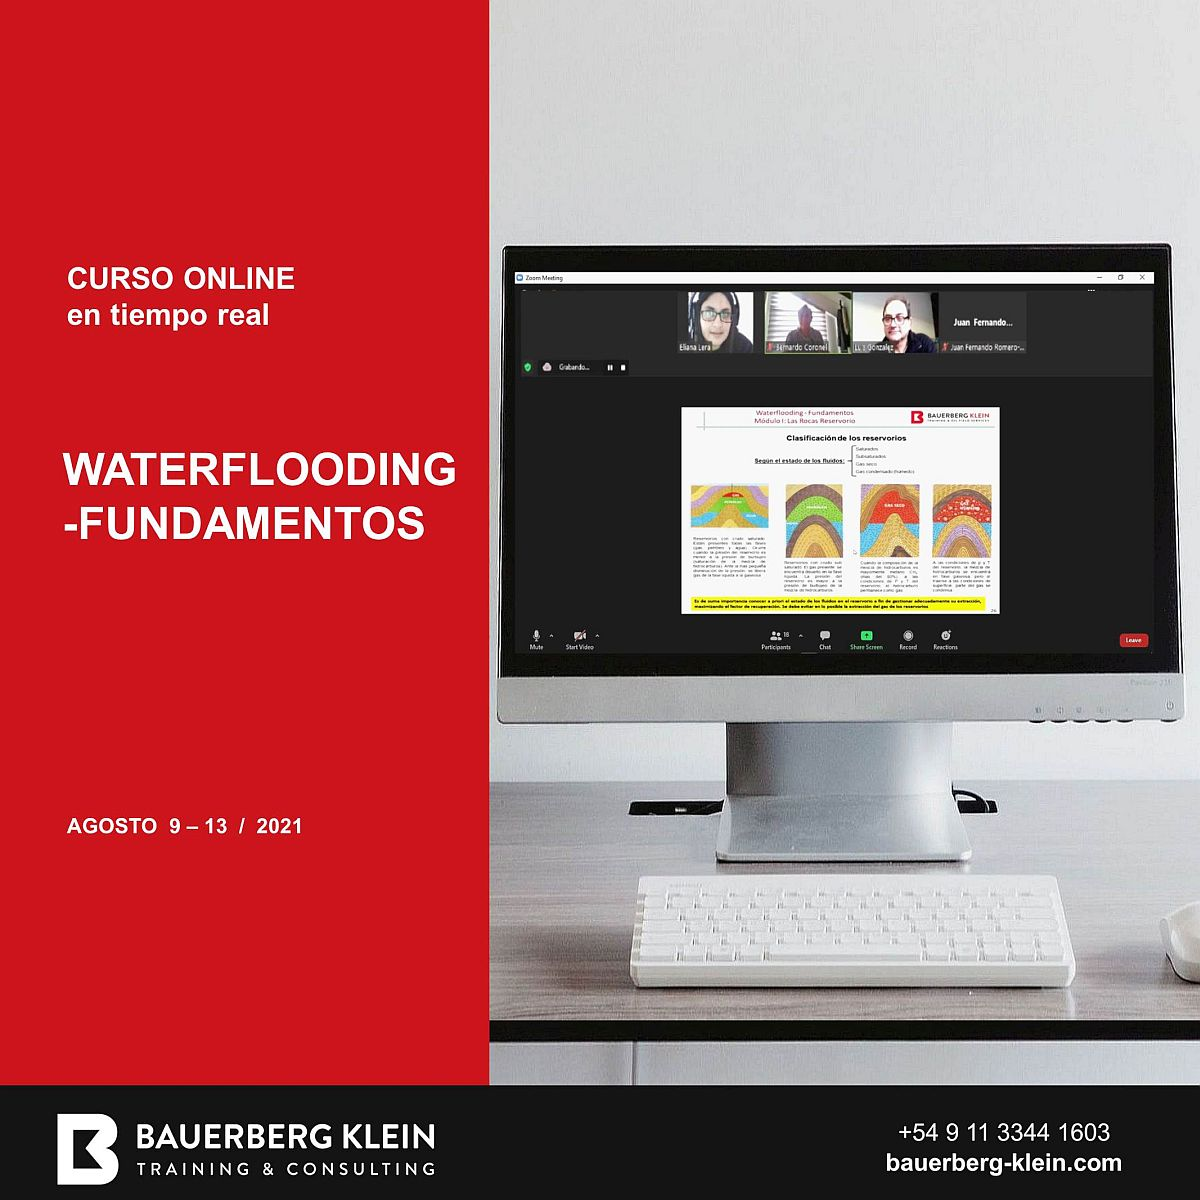 Waterflooding - Fundamentos